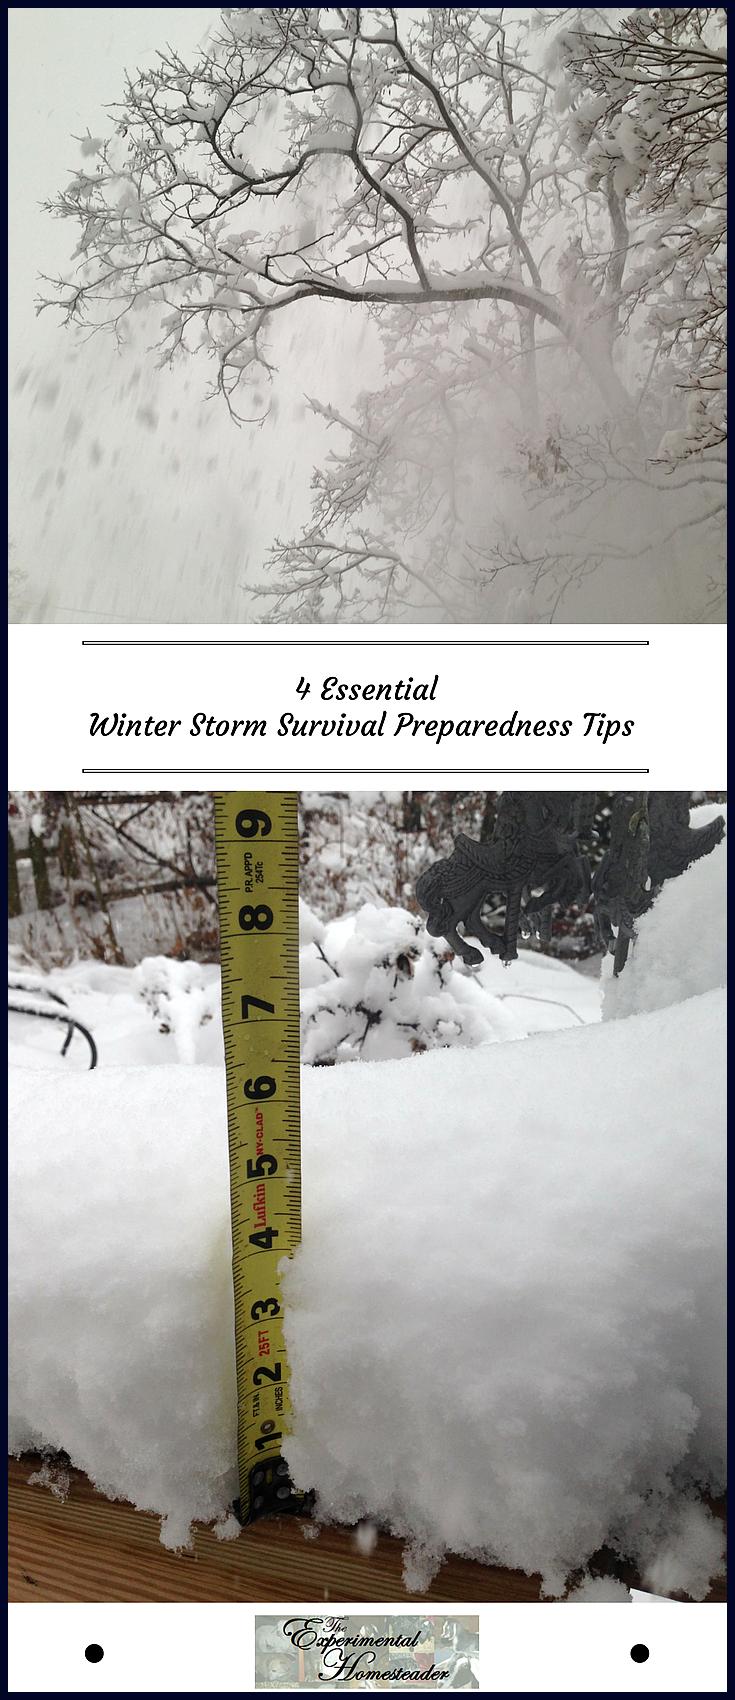 4 Essential Winter Storm Survival Preparedness Tips #wintersurvivalsupplies 4 Essential Winter Storm Survival Preparedness Tips, #essential #Preparedness #snowwinterstorm #STORM #Survival #Tips #Winter #winterstormpreparednessathome